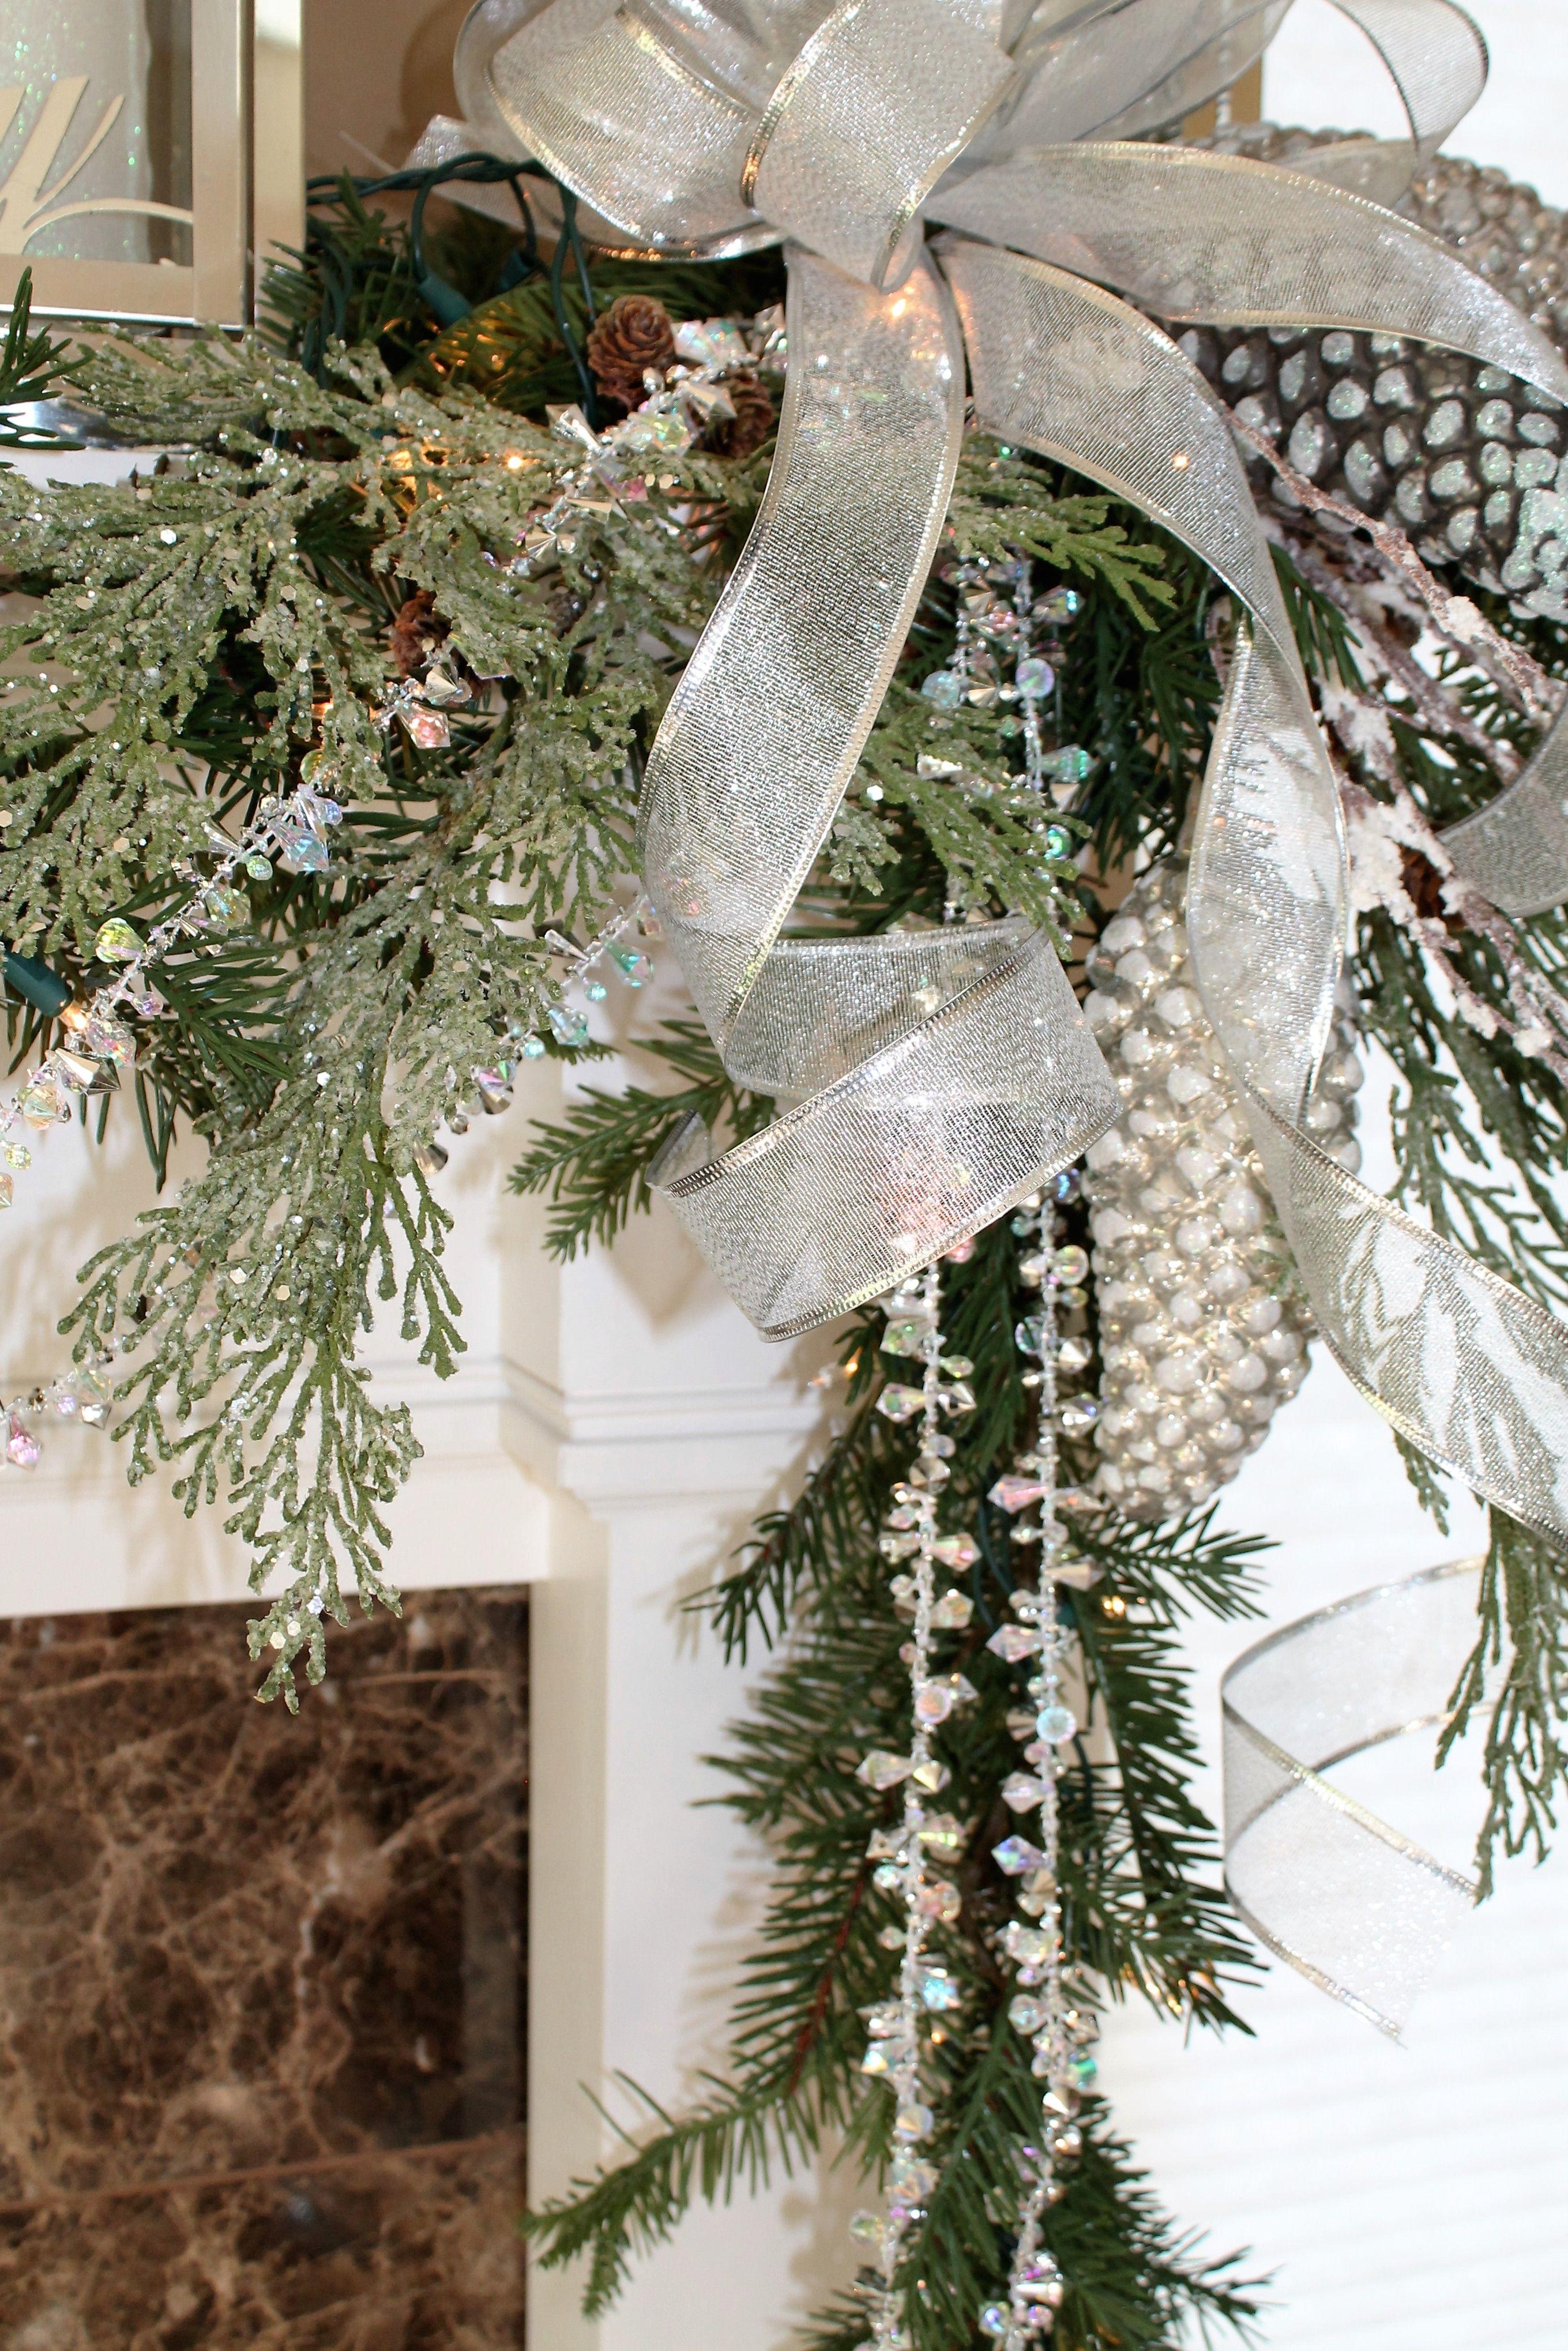 9 Iridescent Silver Bead Garland Christmas Mantel Decorations